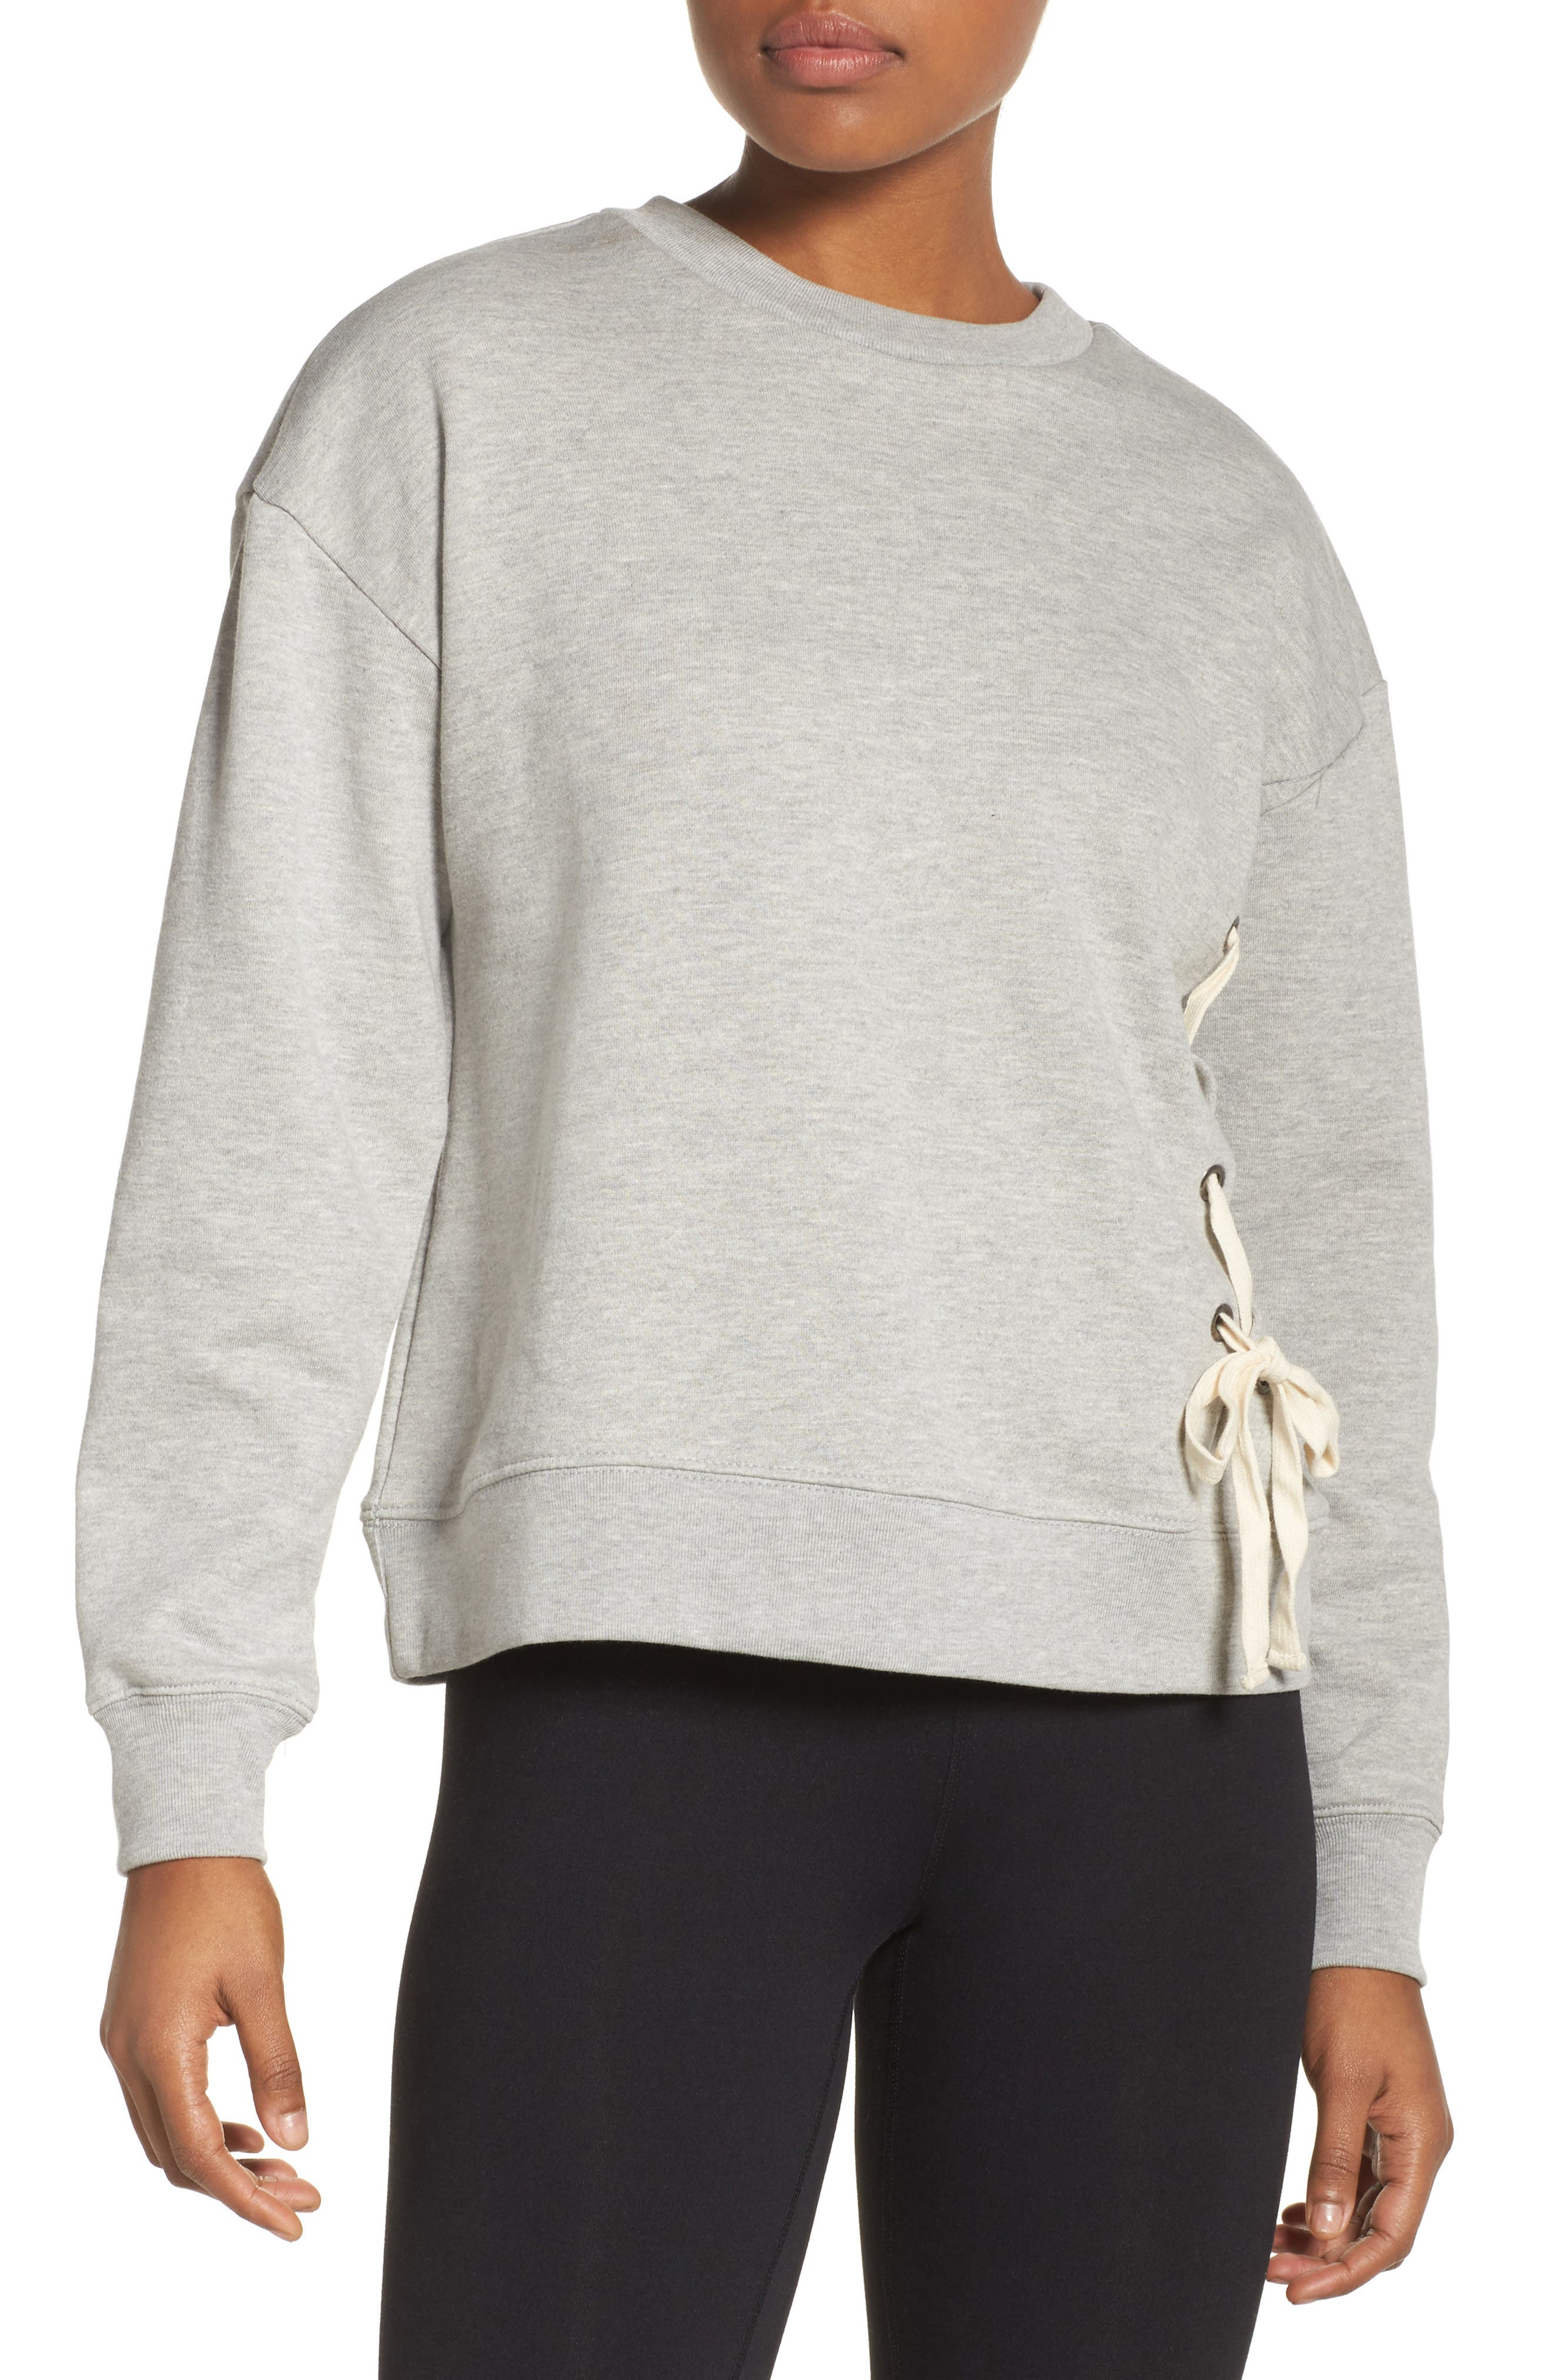 Women's Sweatshirts & Hoodies Tops & Tees | Nordstrom